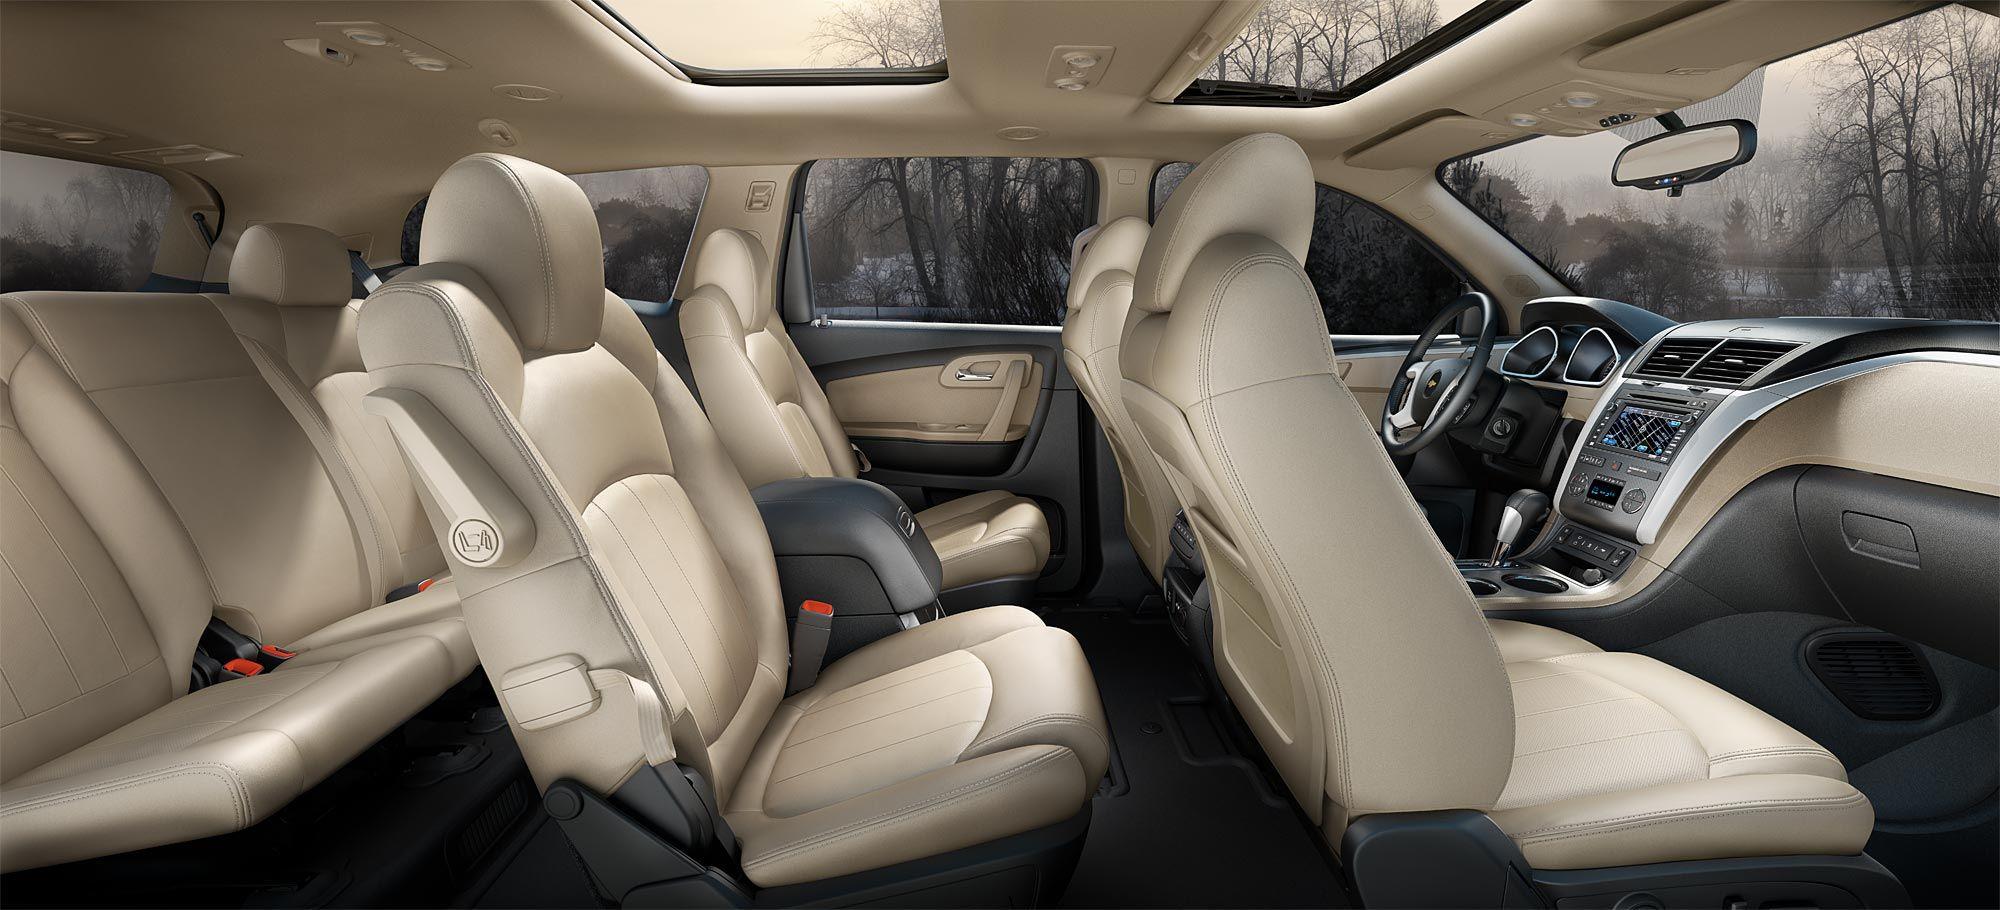 Car interior entertainment - Interior Of A Chevy Traverse My Next Family Car W Entertainment System